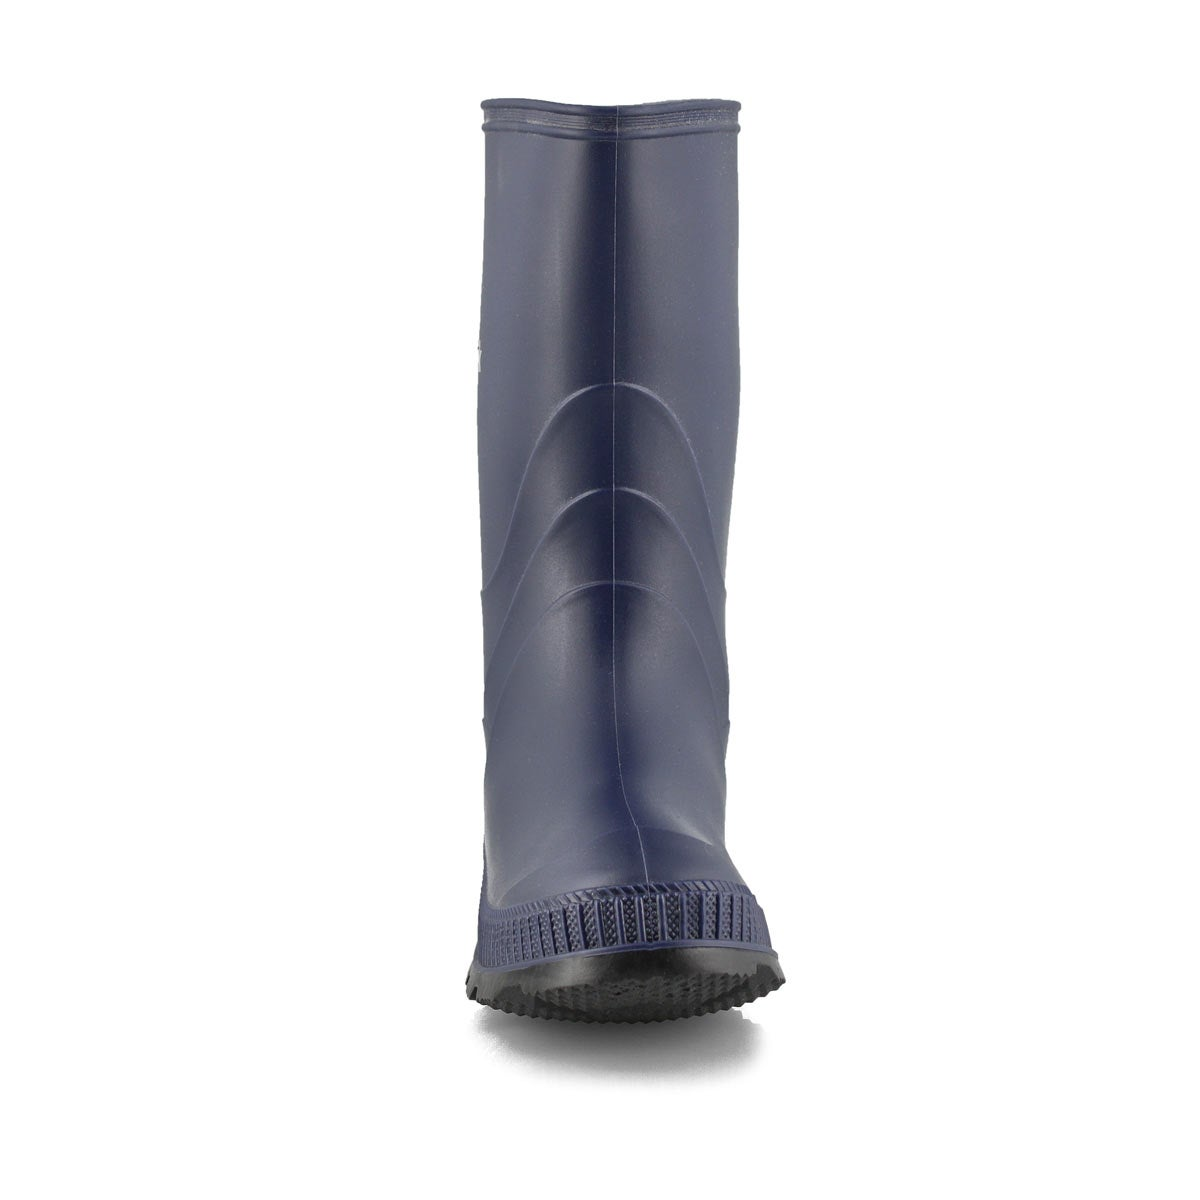 Bys Stomp navy waterproof rain boot